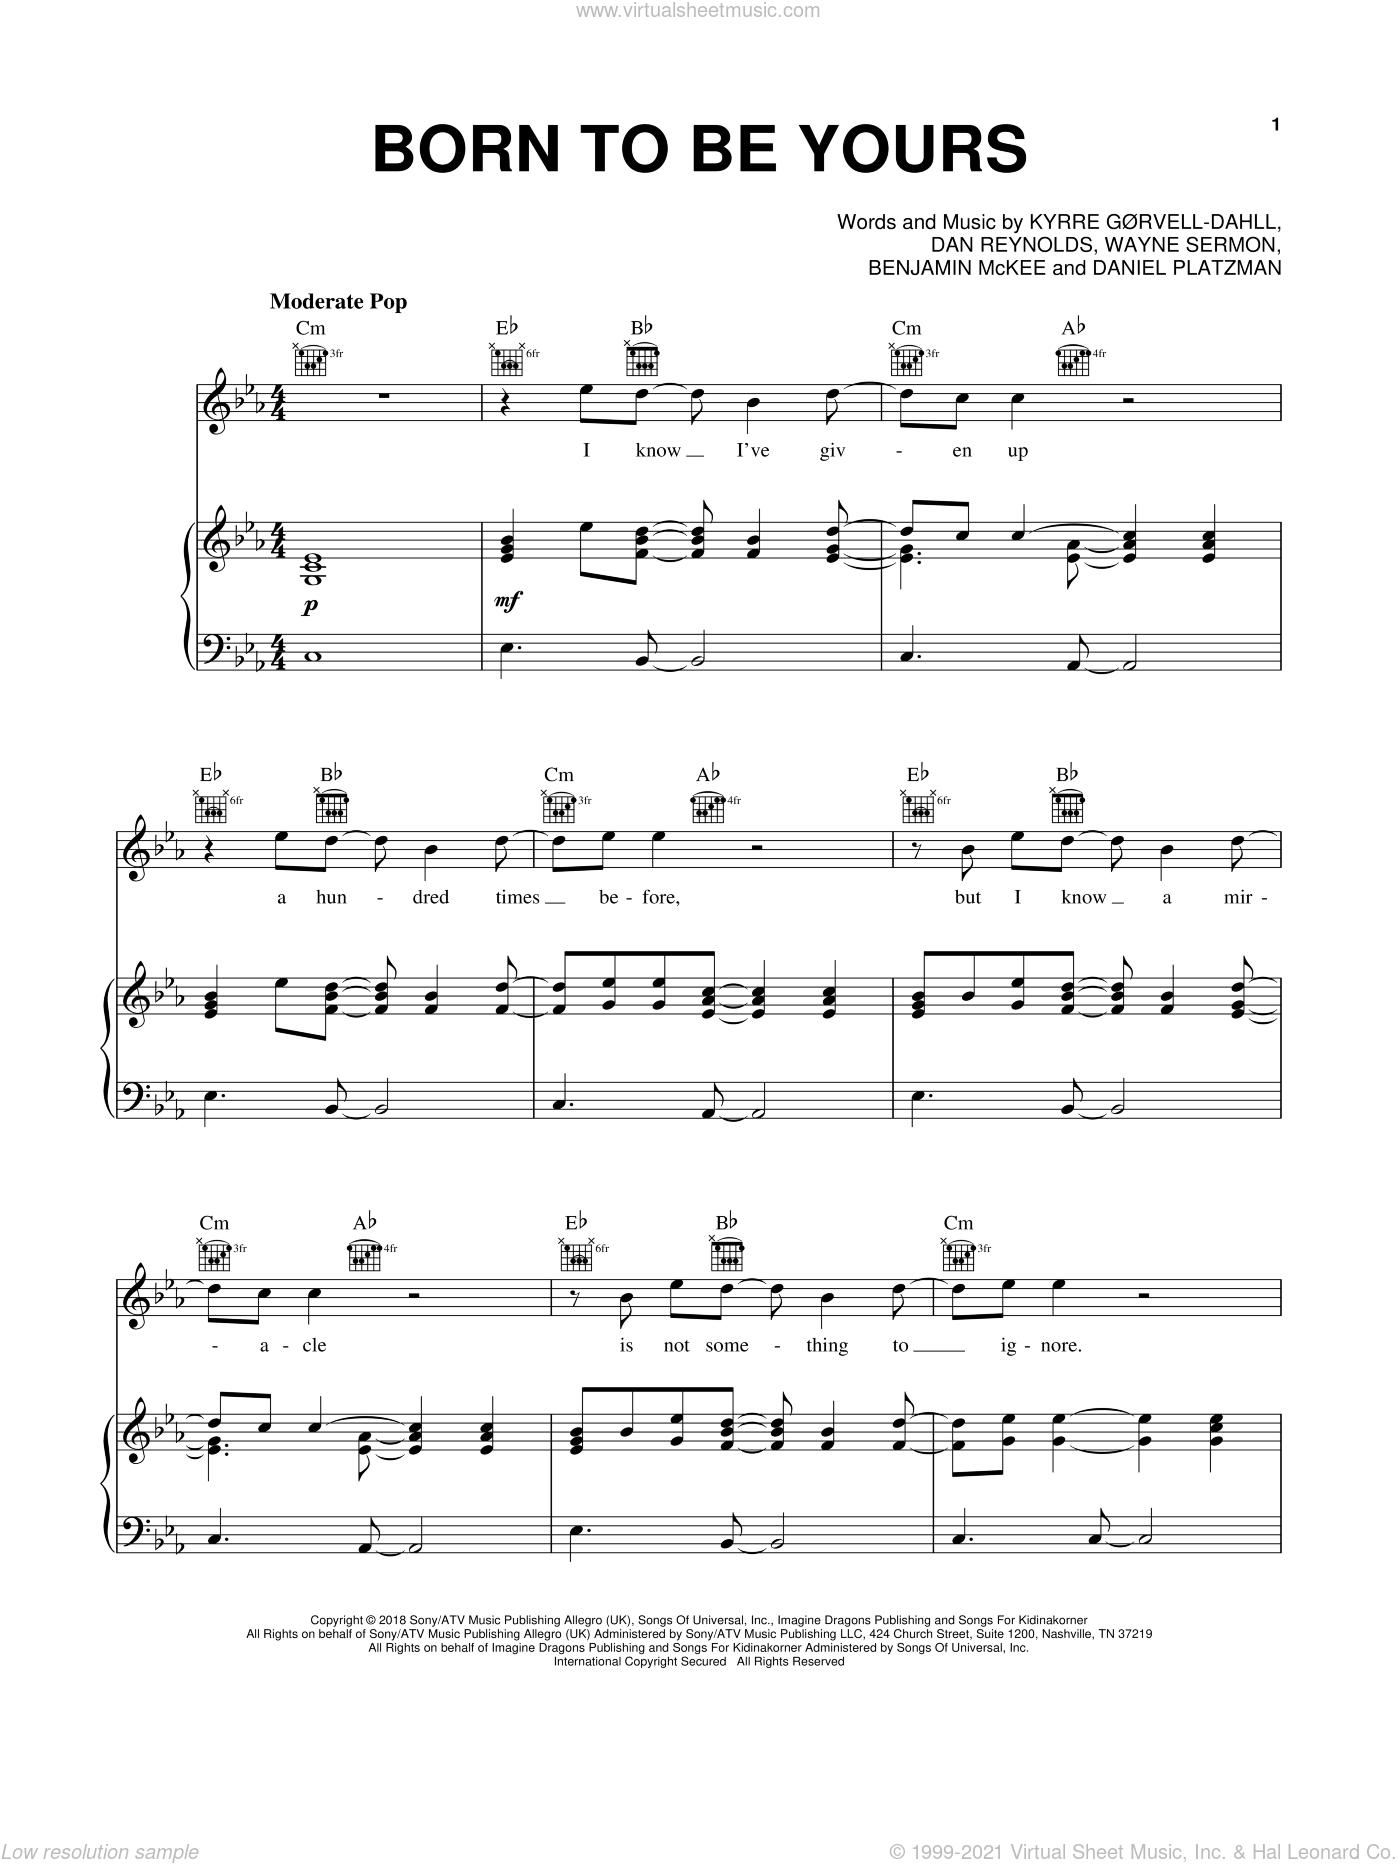 Born To Be Yours sheet music for voice, piano or guitar by Kygo & Imagine Dragons, Ben McKee, Dan Reynolds, Daniel Platzman, Kyrre Gorvell-Dahll and Wayne Sermon, intermediate skill level